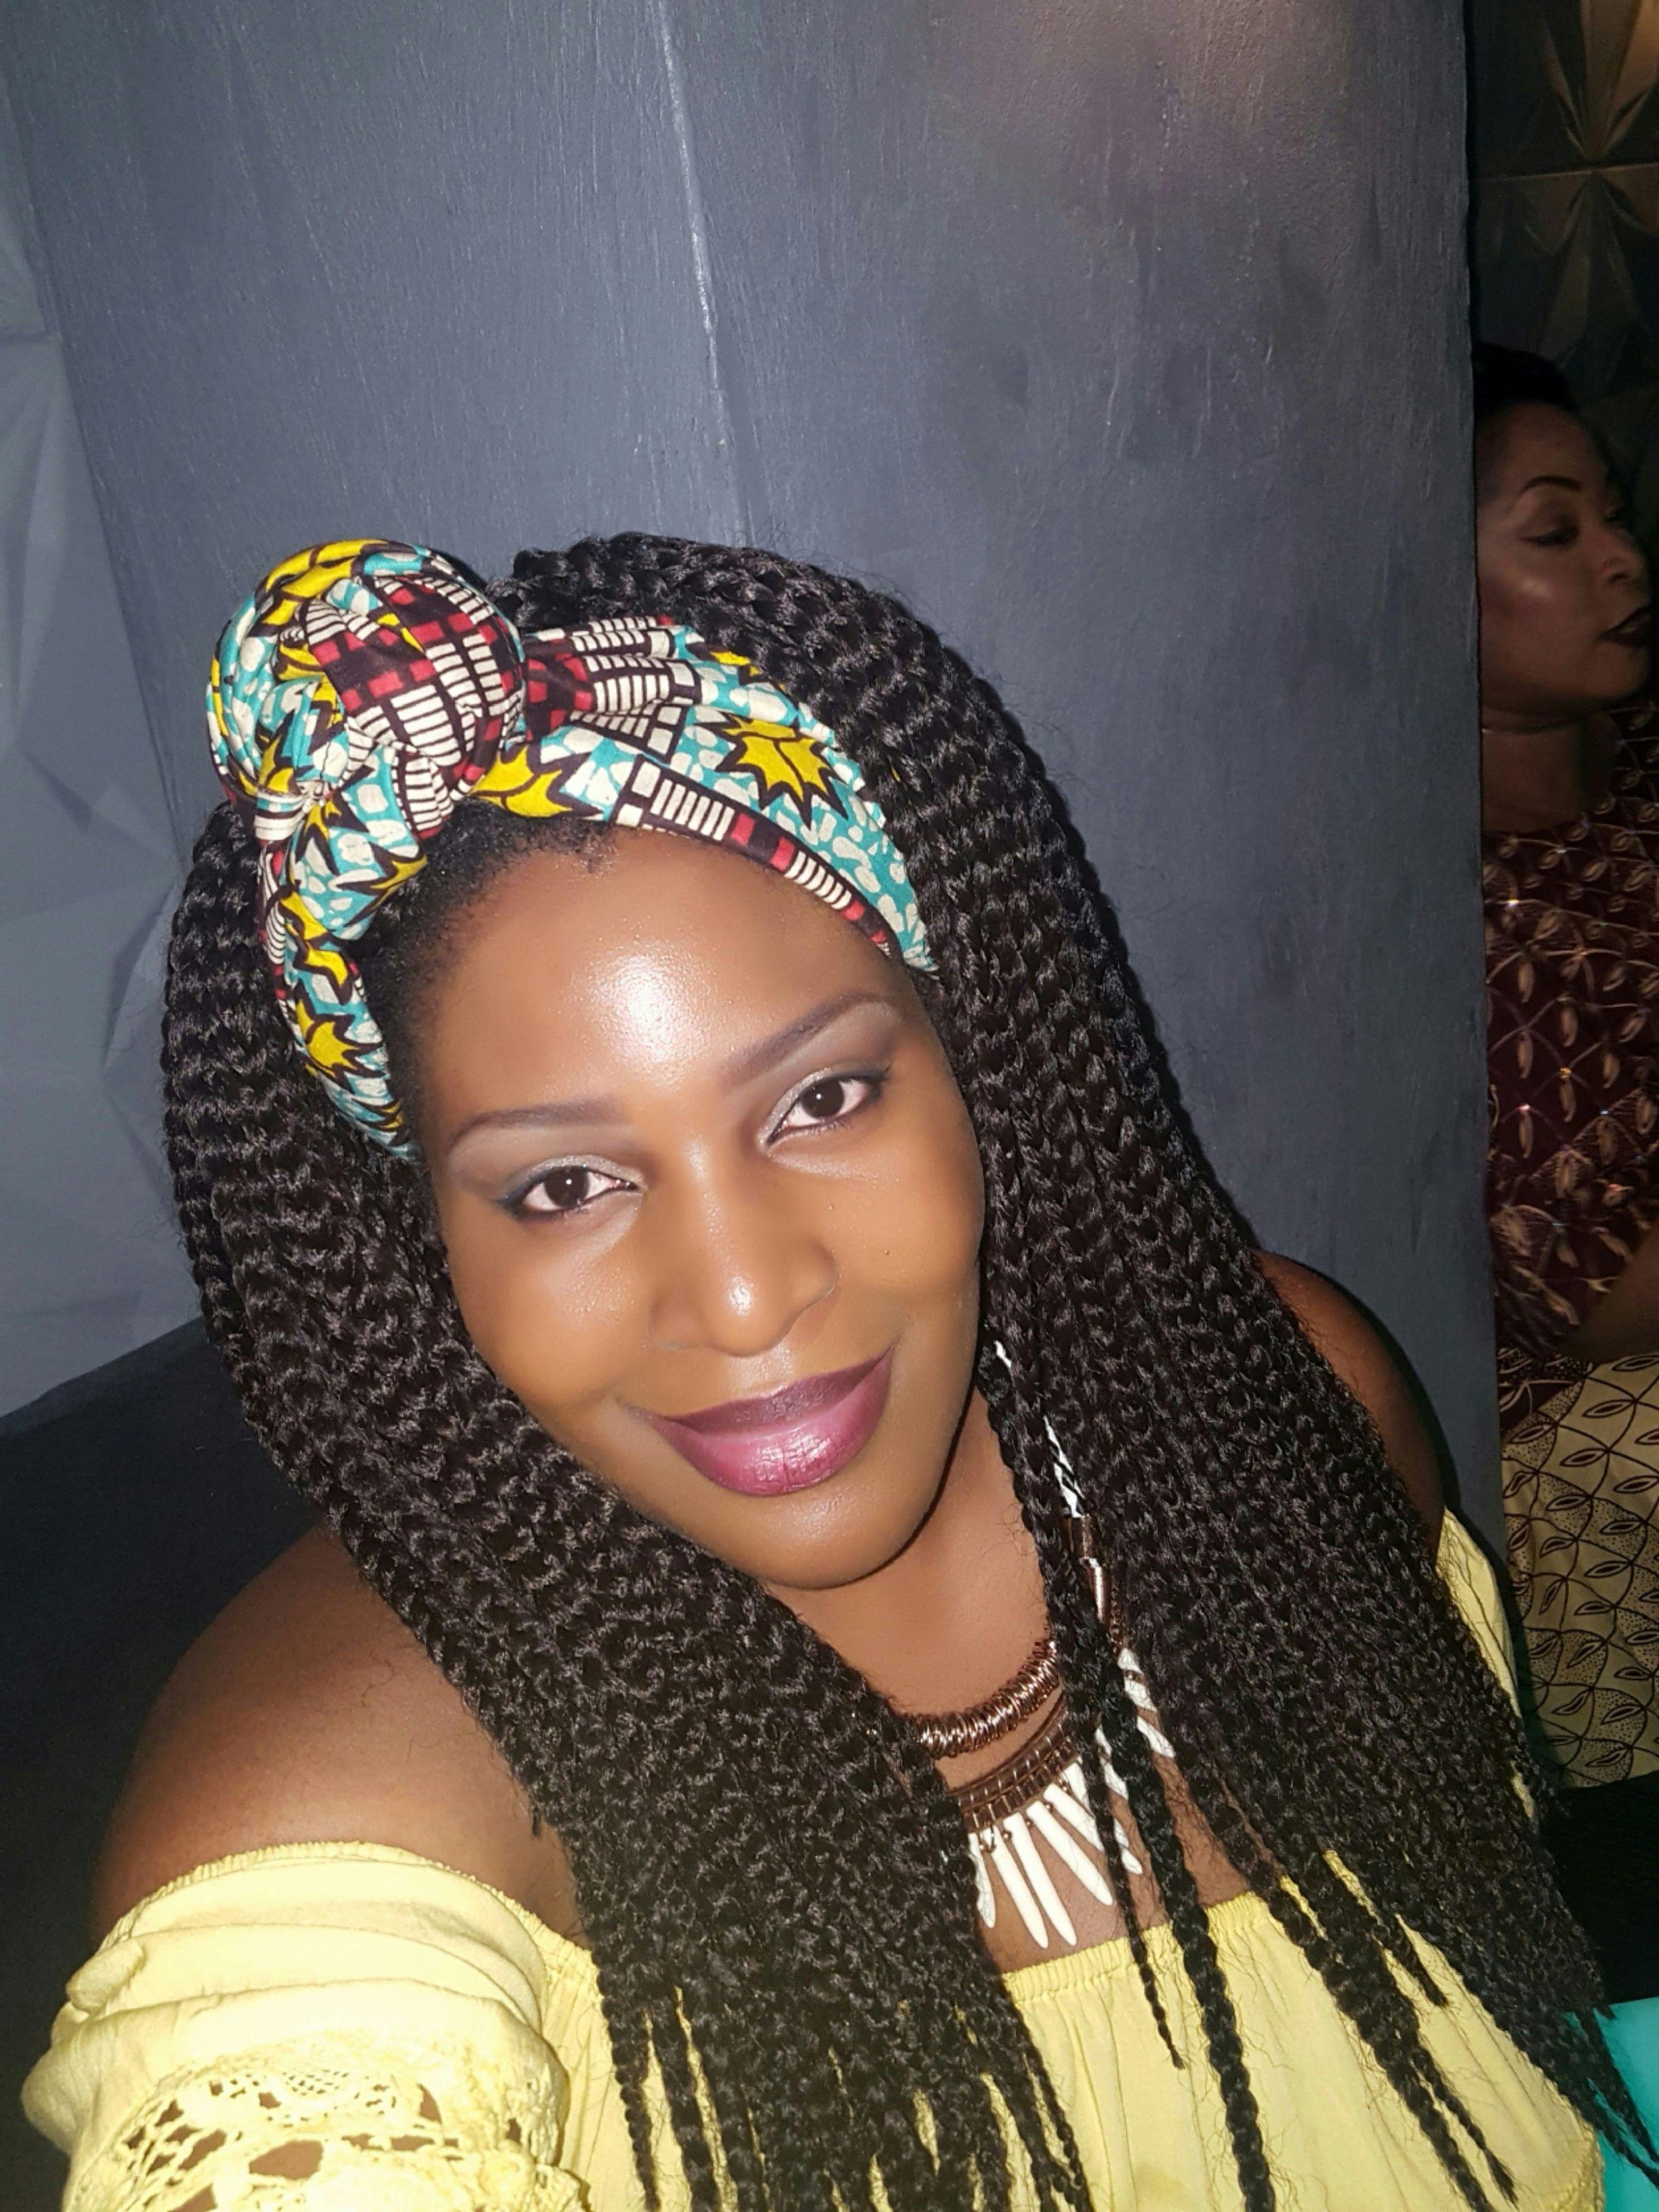 nigerian dating in london